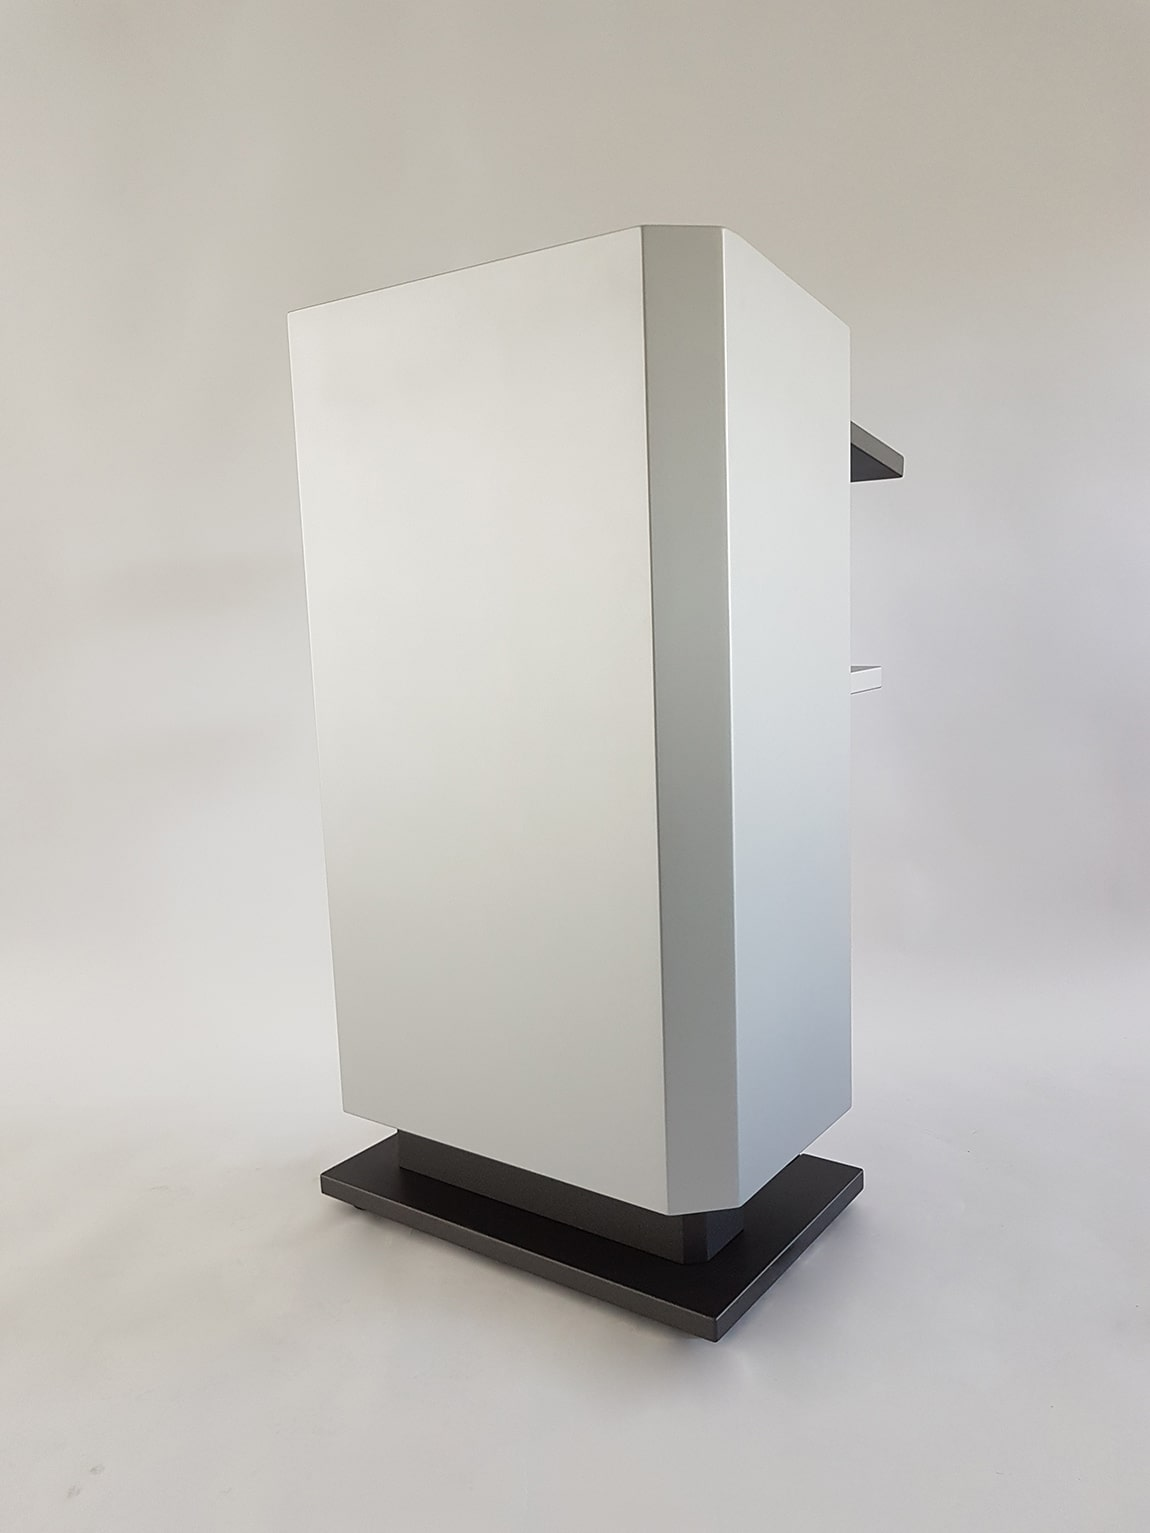 Höhenverstellbares Rednerpult faircom kubus